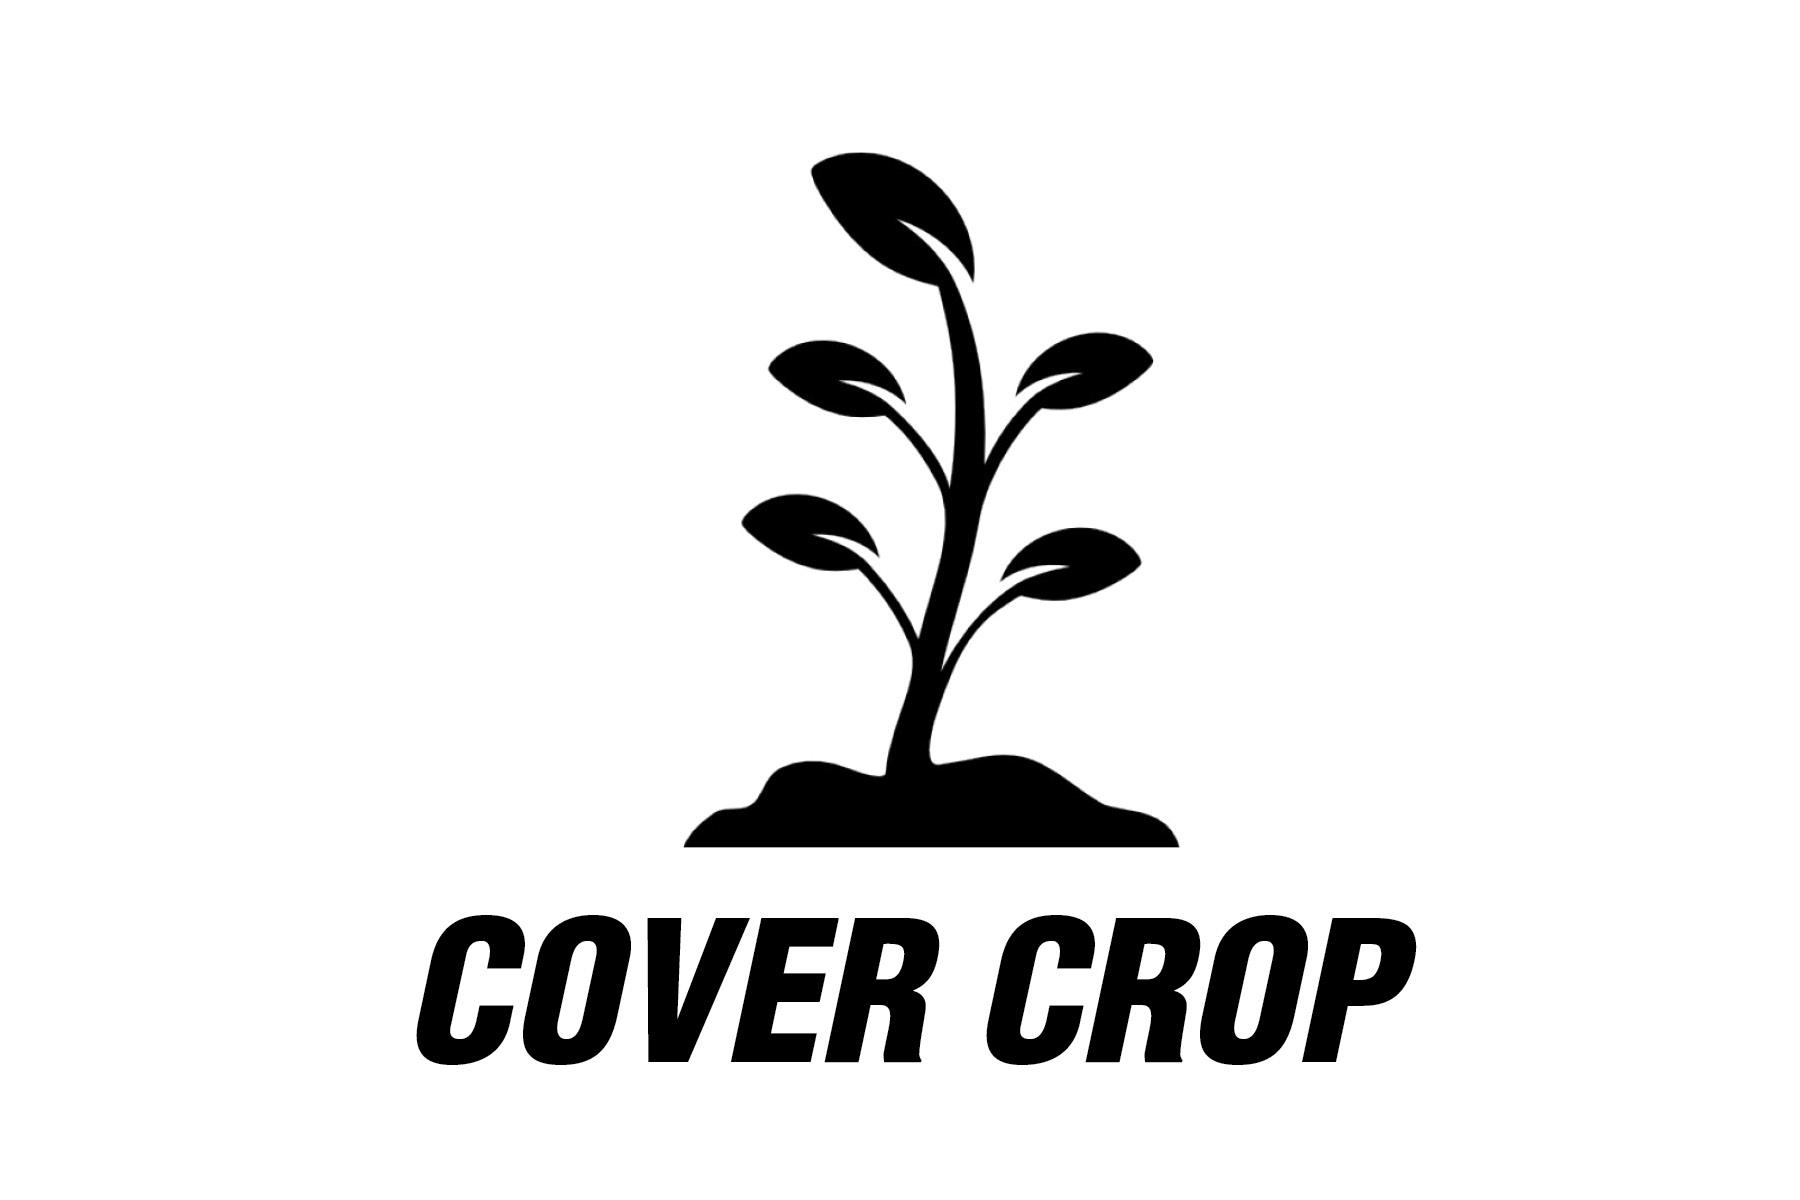 BBI MagnaSpread3 Cover Crops